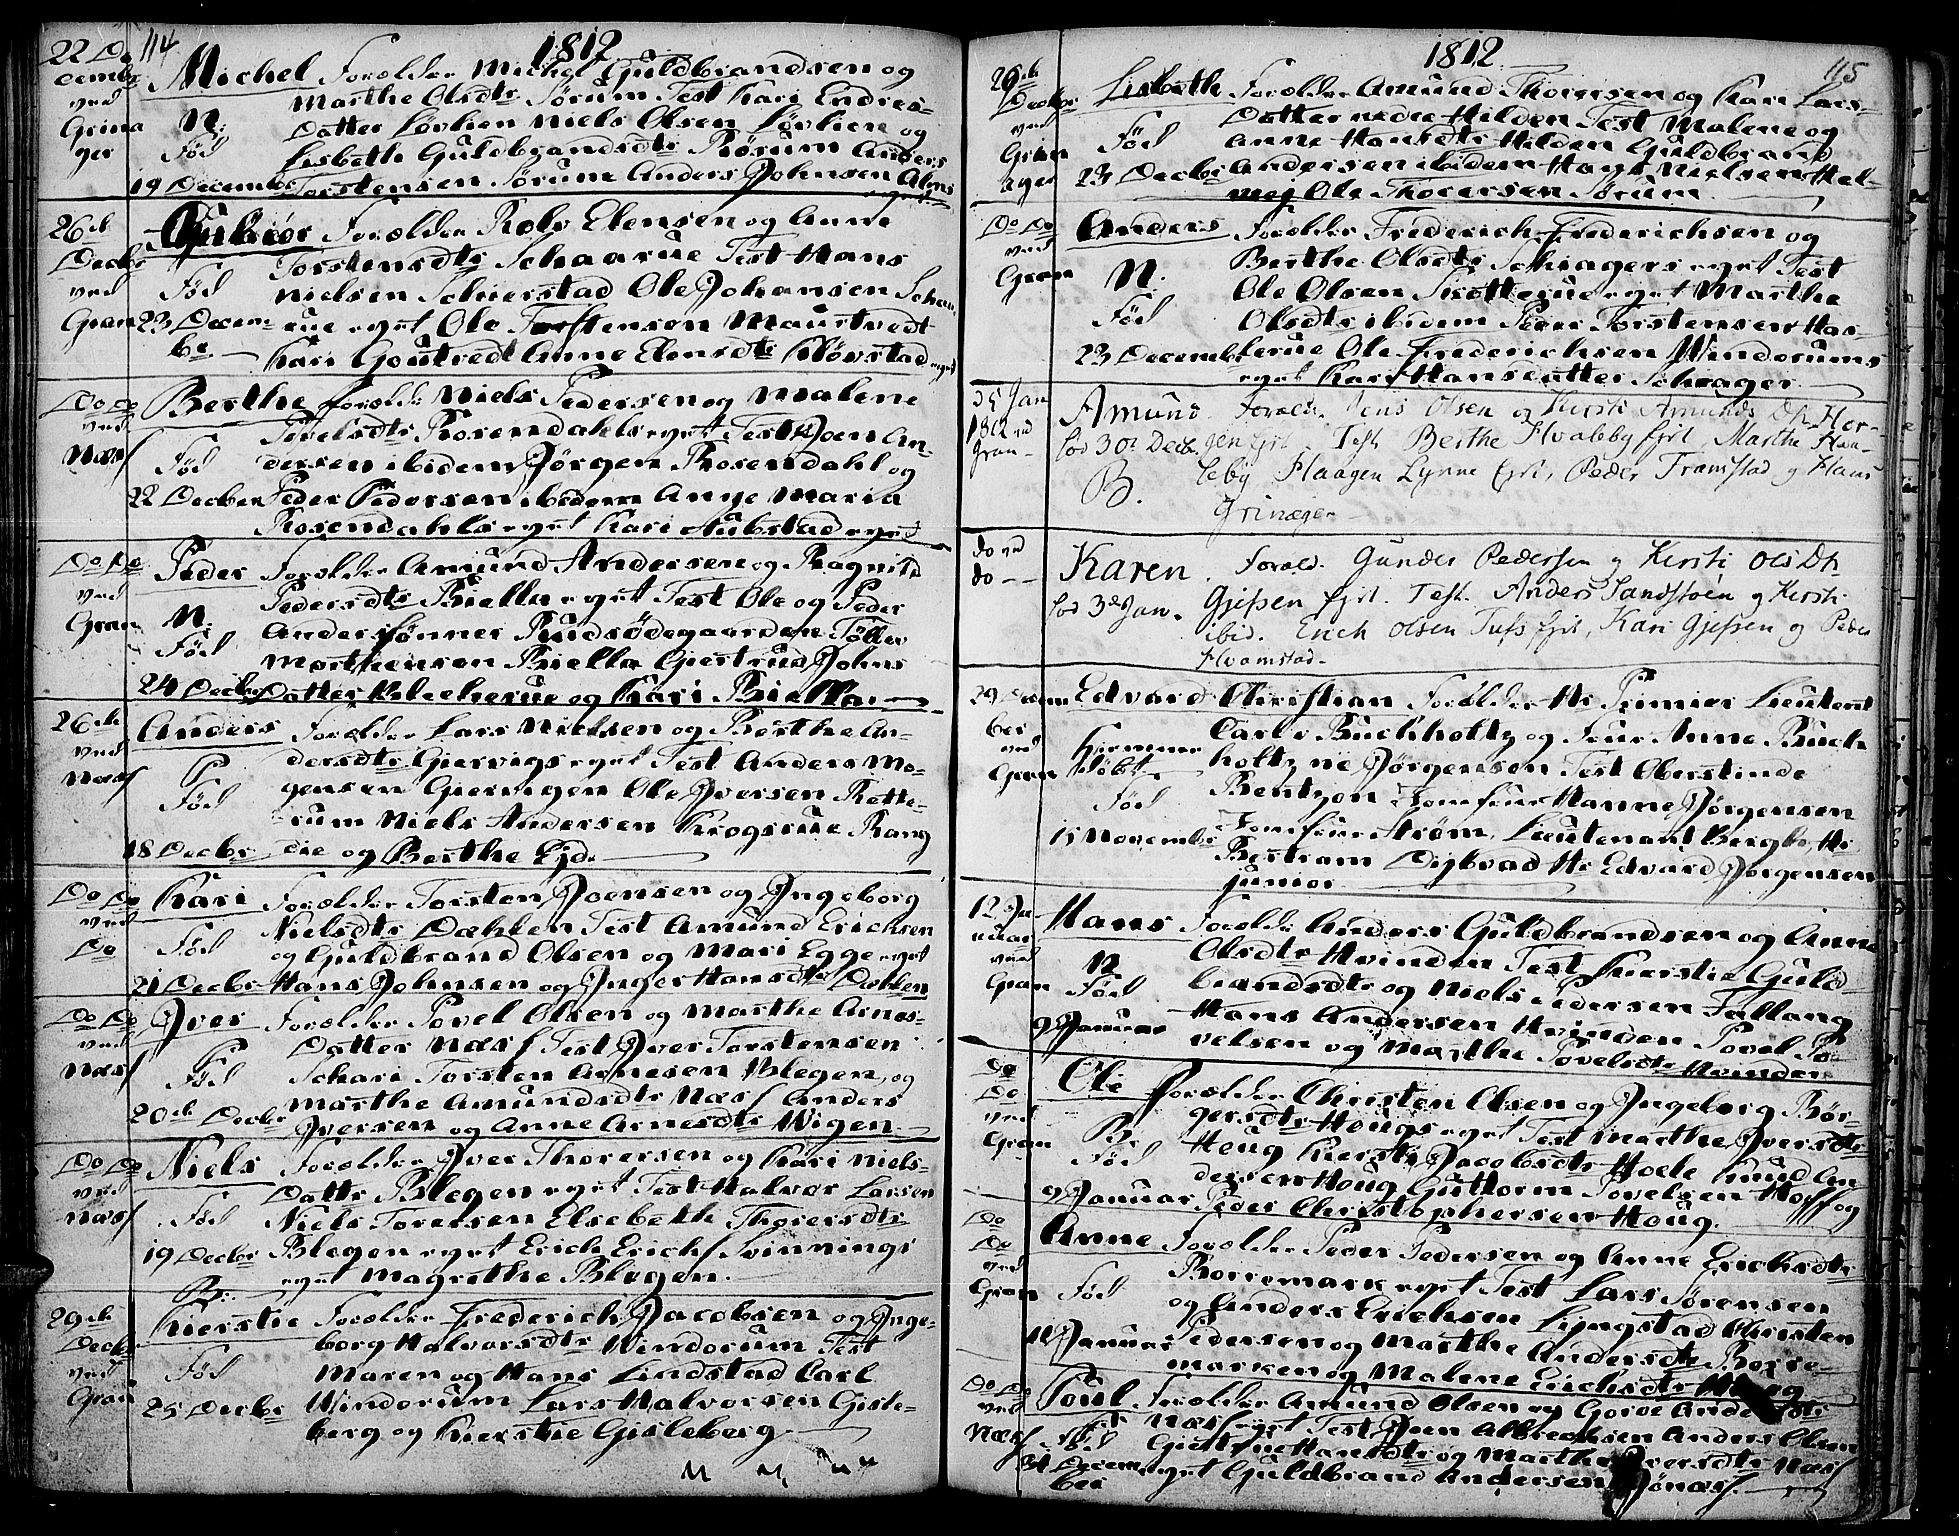 SAH, Gran prestekontor, Ministerialbok nr. 7, 1804-1815, s. 114-115